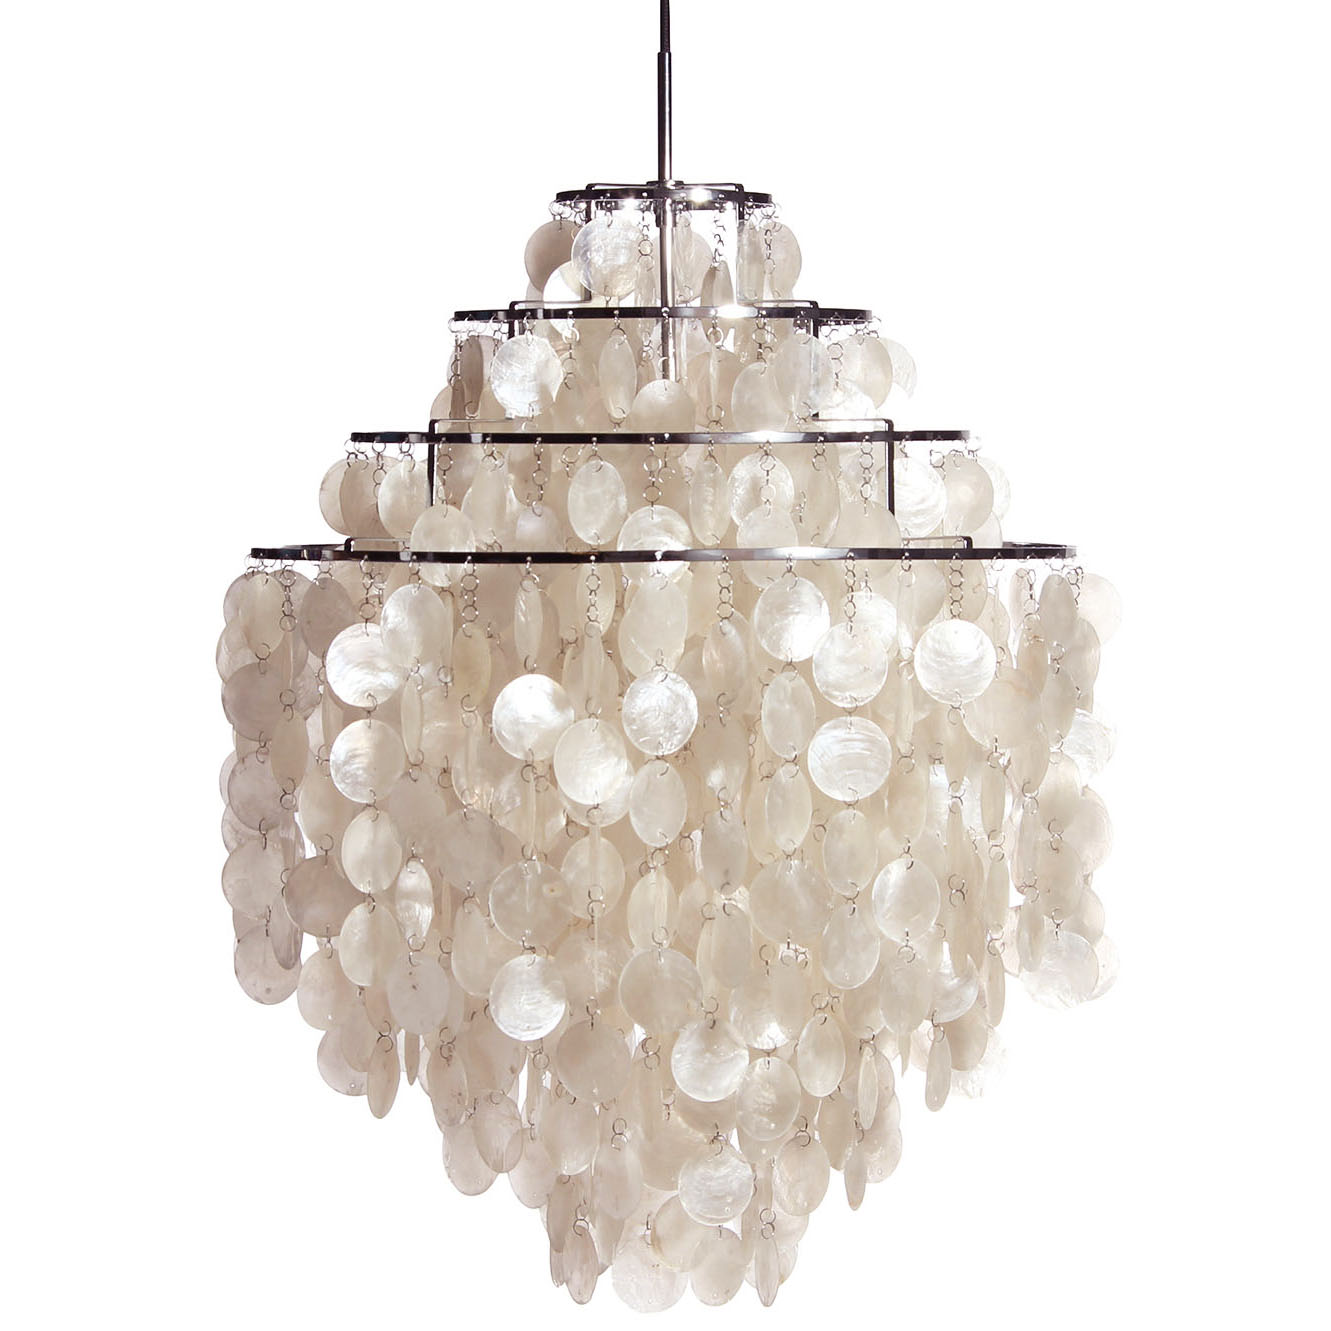 Large White Fun 0 Dm Shell Capiz Ceiling Light Pendant Chandelier By Verner Panton